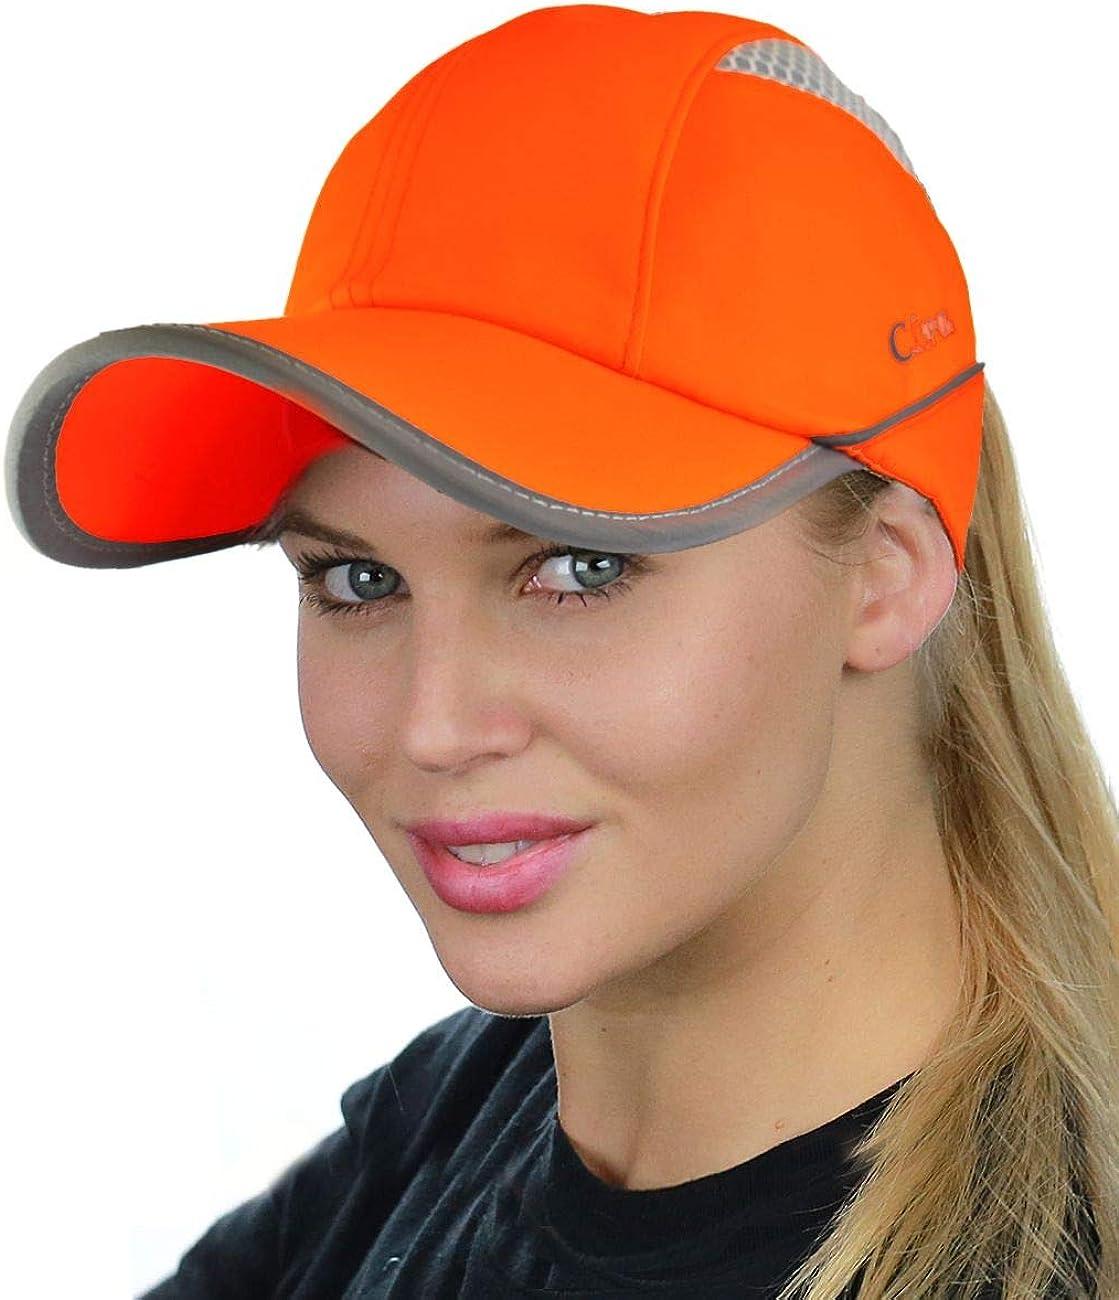 C.C Ponycap Messy High Bun Ponytail Water Resistant Adjustable Mesh Reflective Sporty Baseball Cap